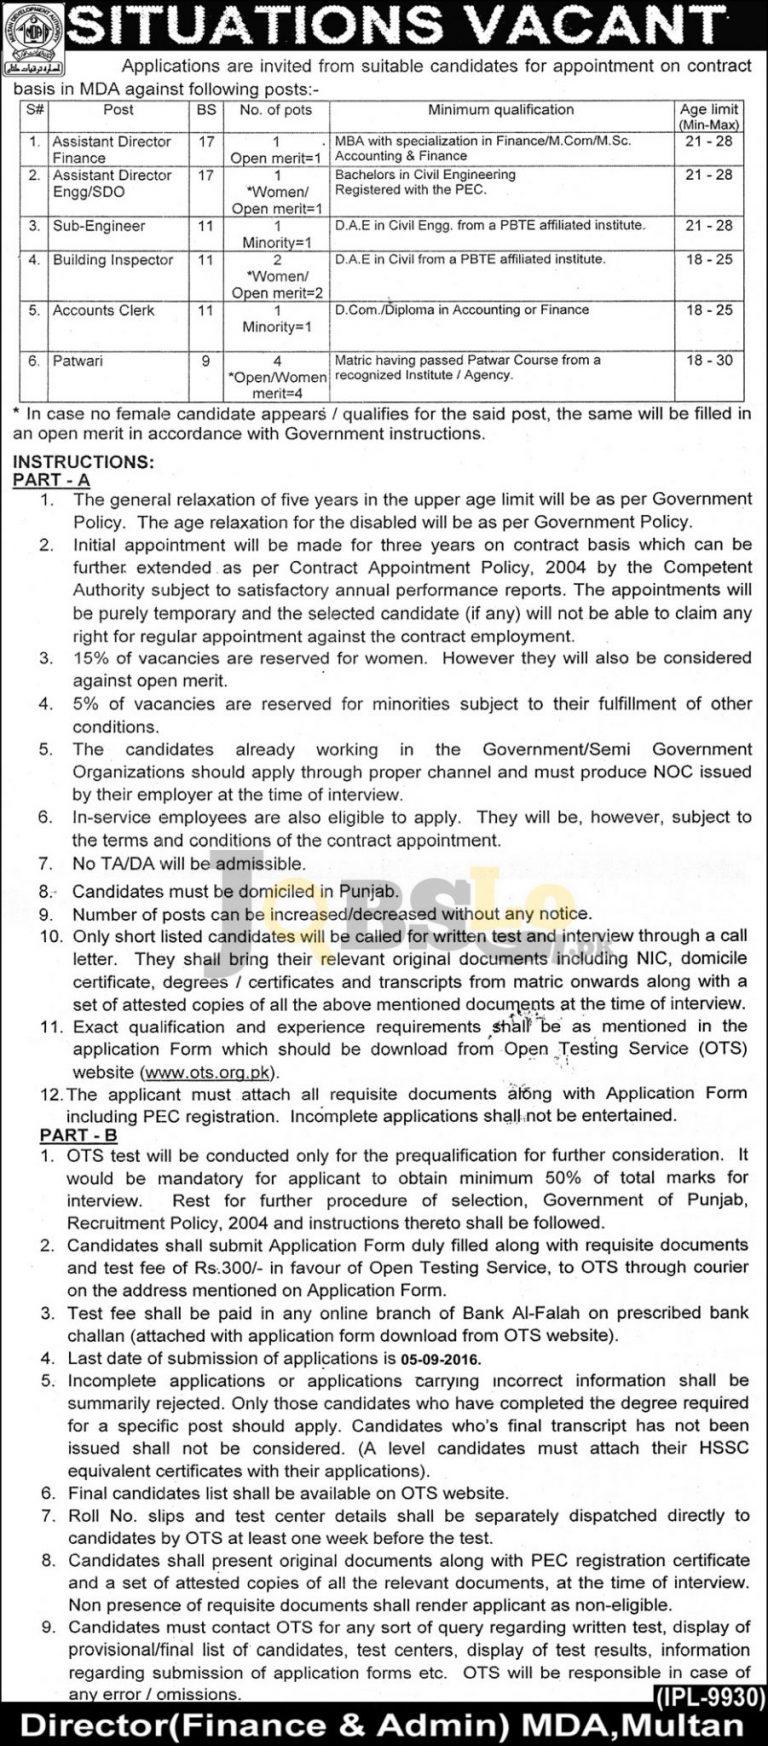 Multan Development Authority MDA Jobs August/ September 2016 Online Application Forms www.ots.org.pk